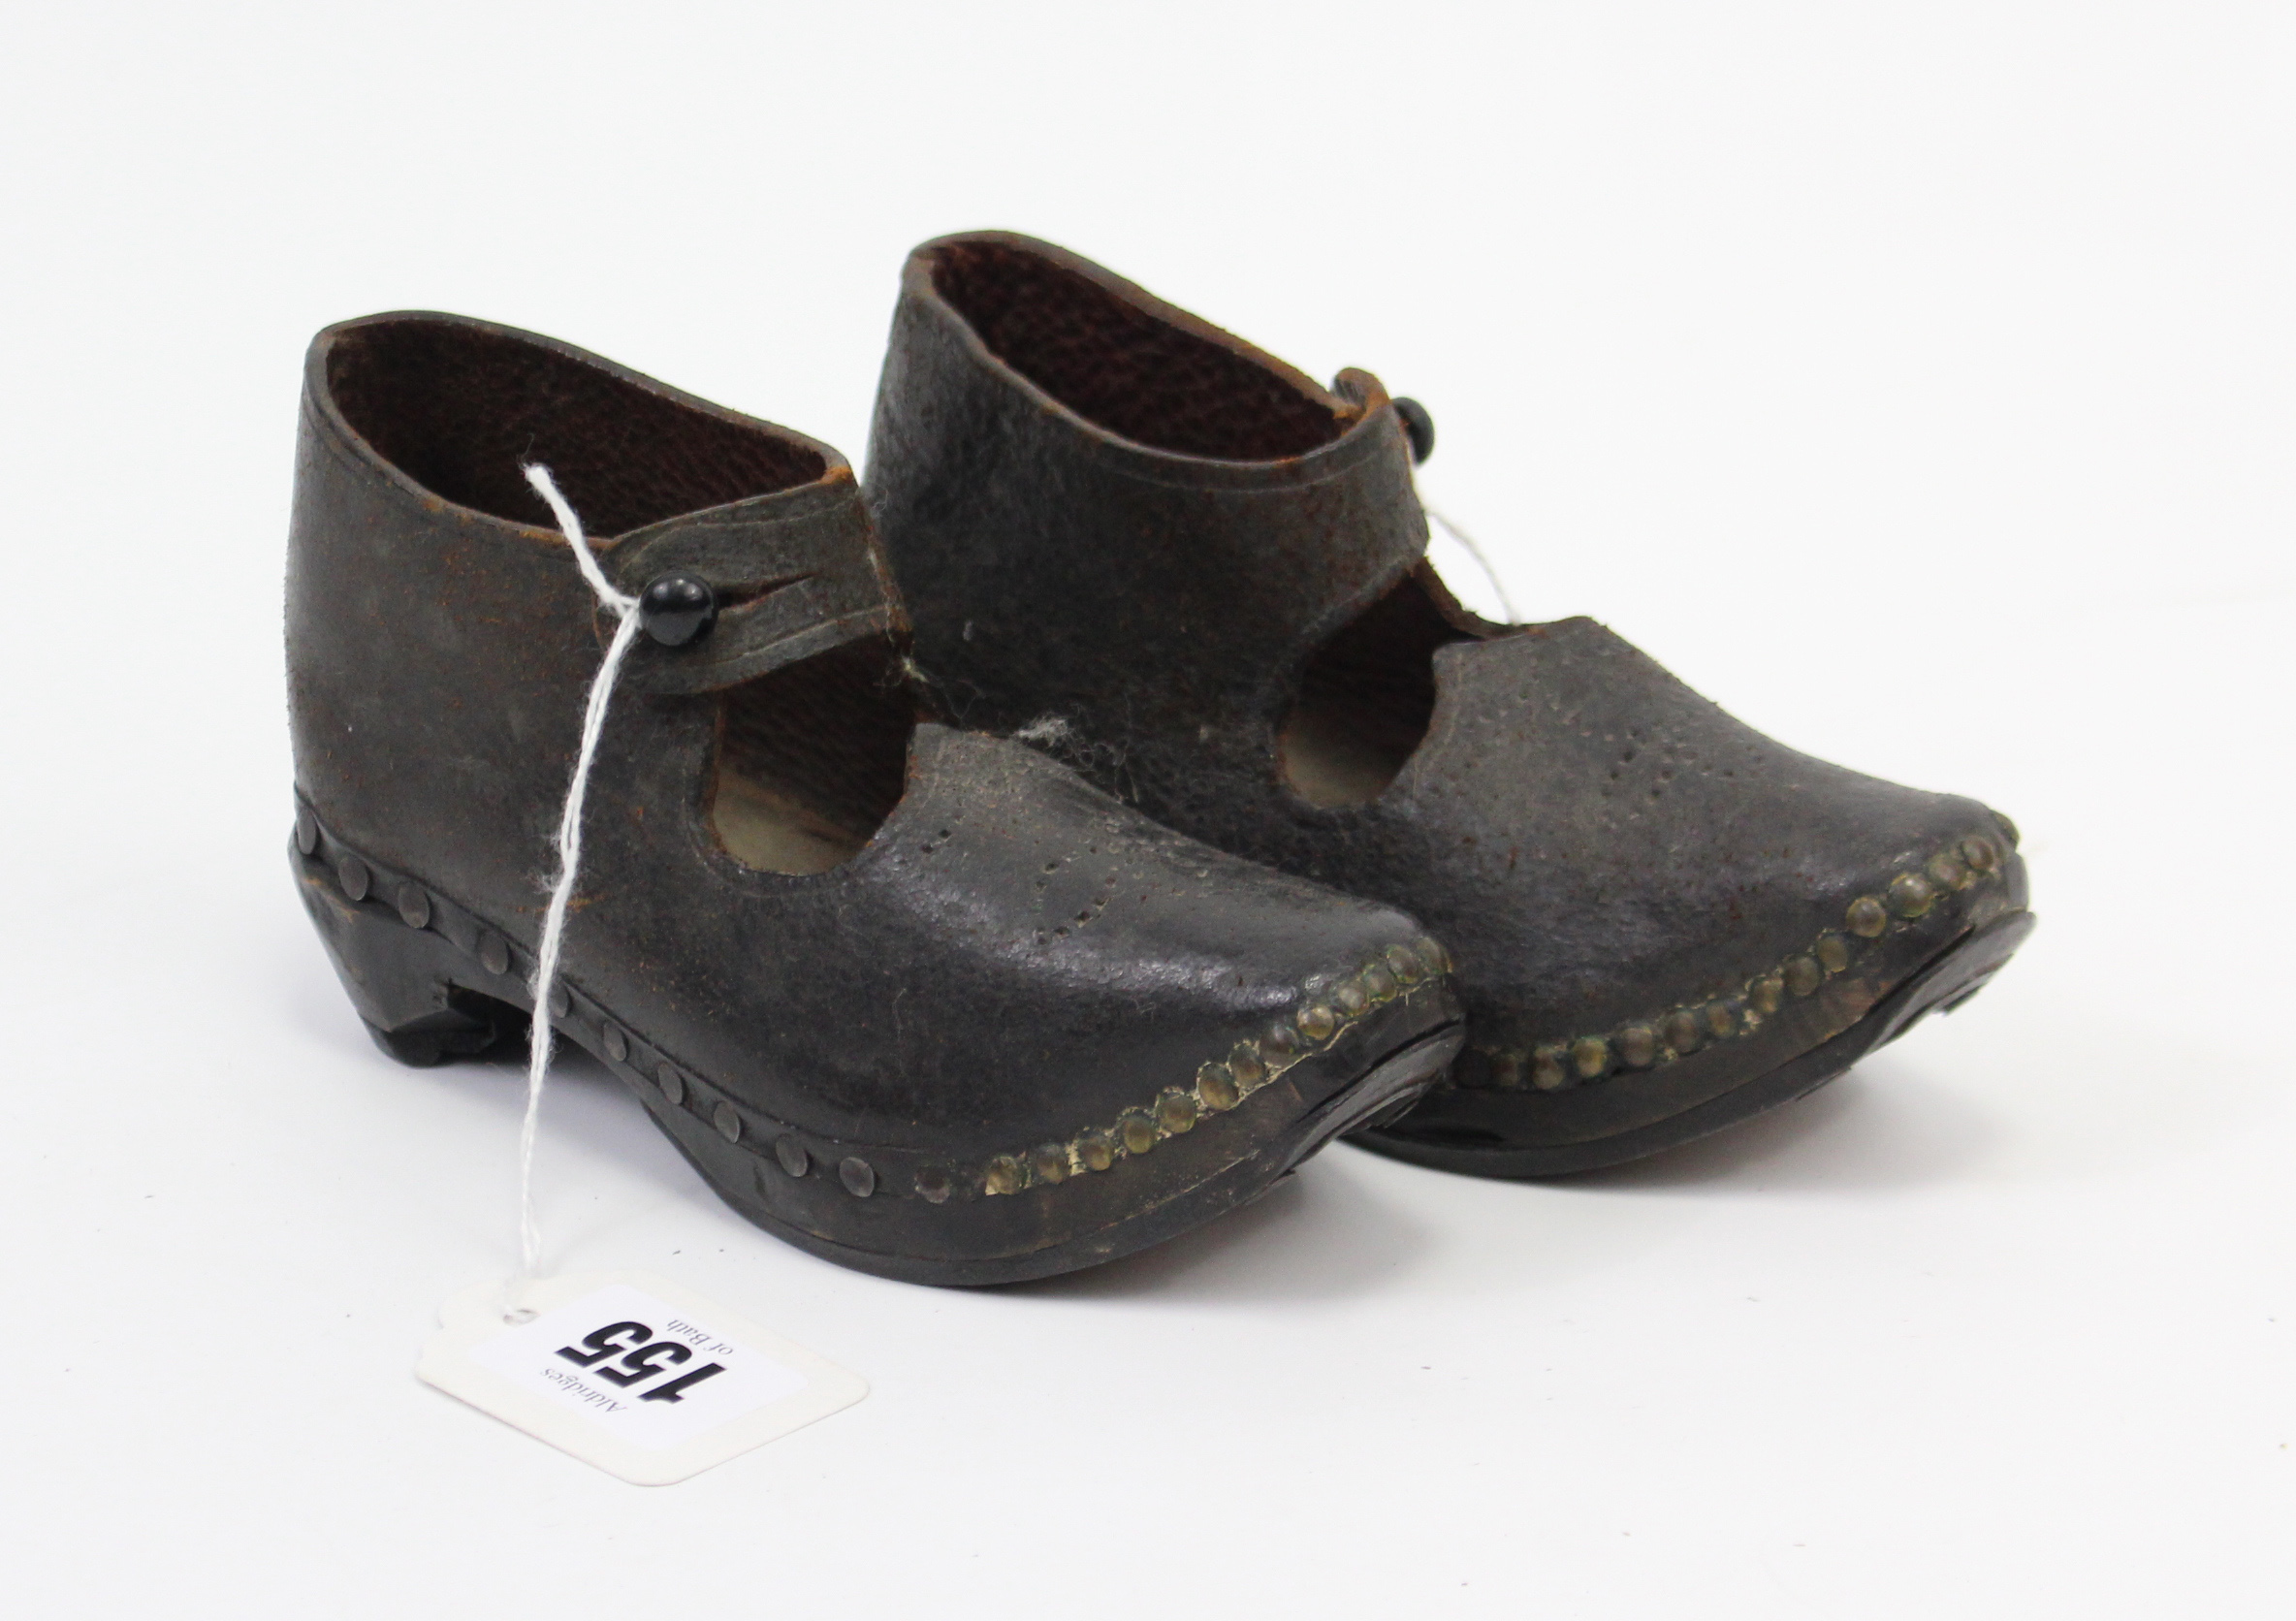 Lot 155 - A pair of children's clogs.